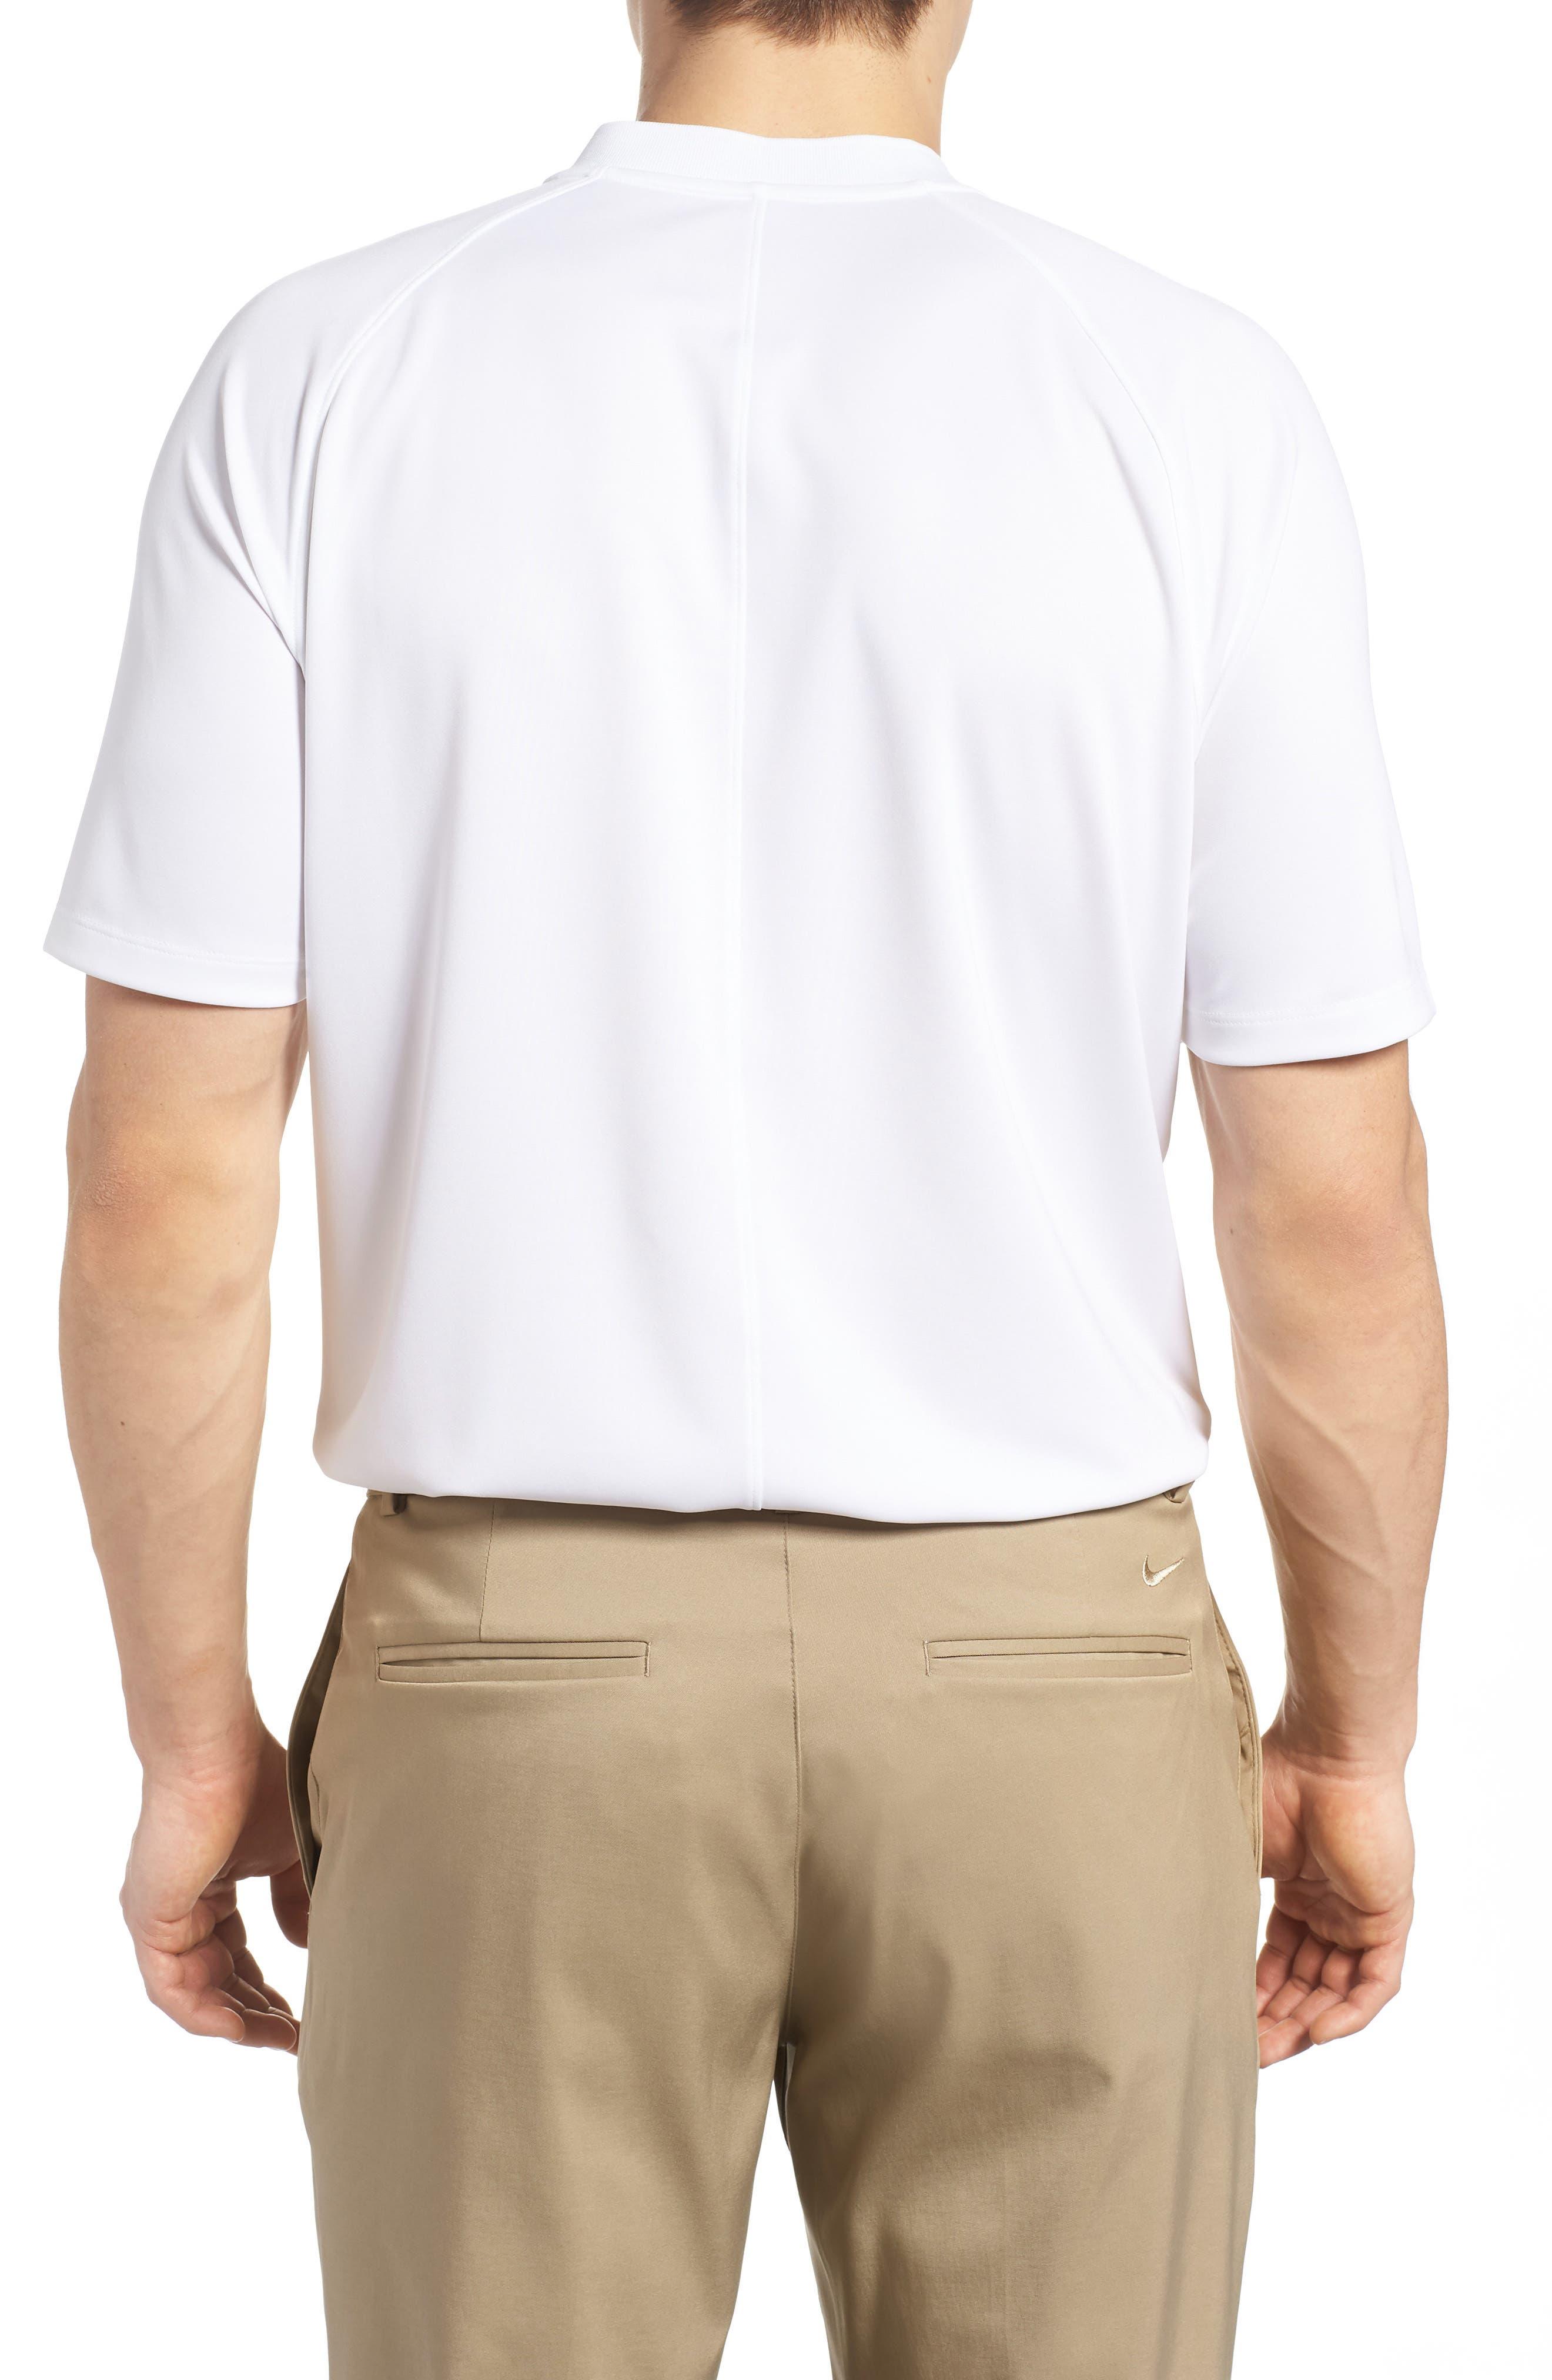 Dry Momentum Golf Polo,                             Alternate thumbnail 2, color,                             White/ White/ Black